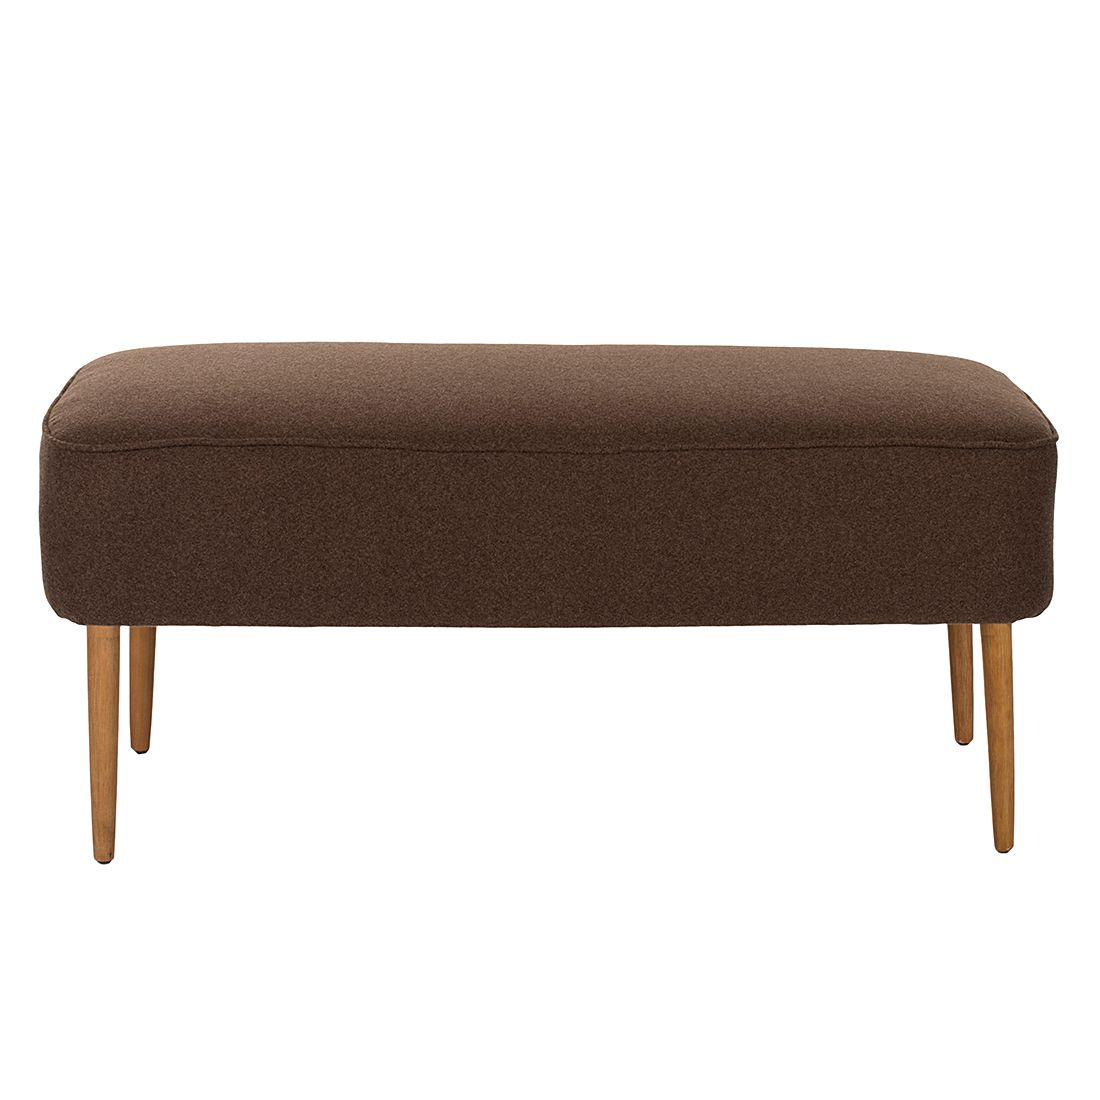 banc madison tissu marron safavieh prix et. Black Bedroom Furniture Sets. Home Design Ideas